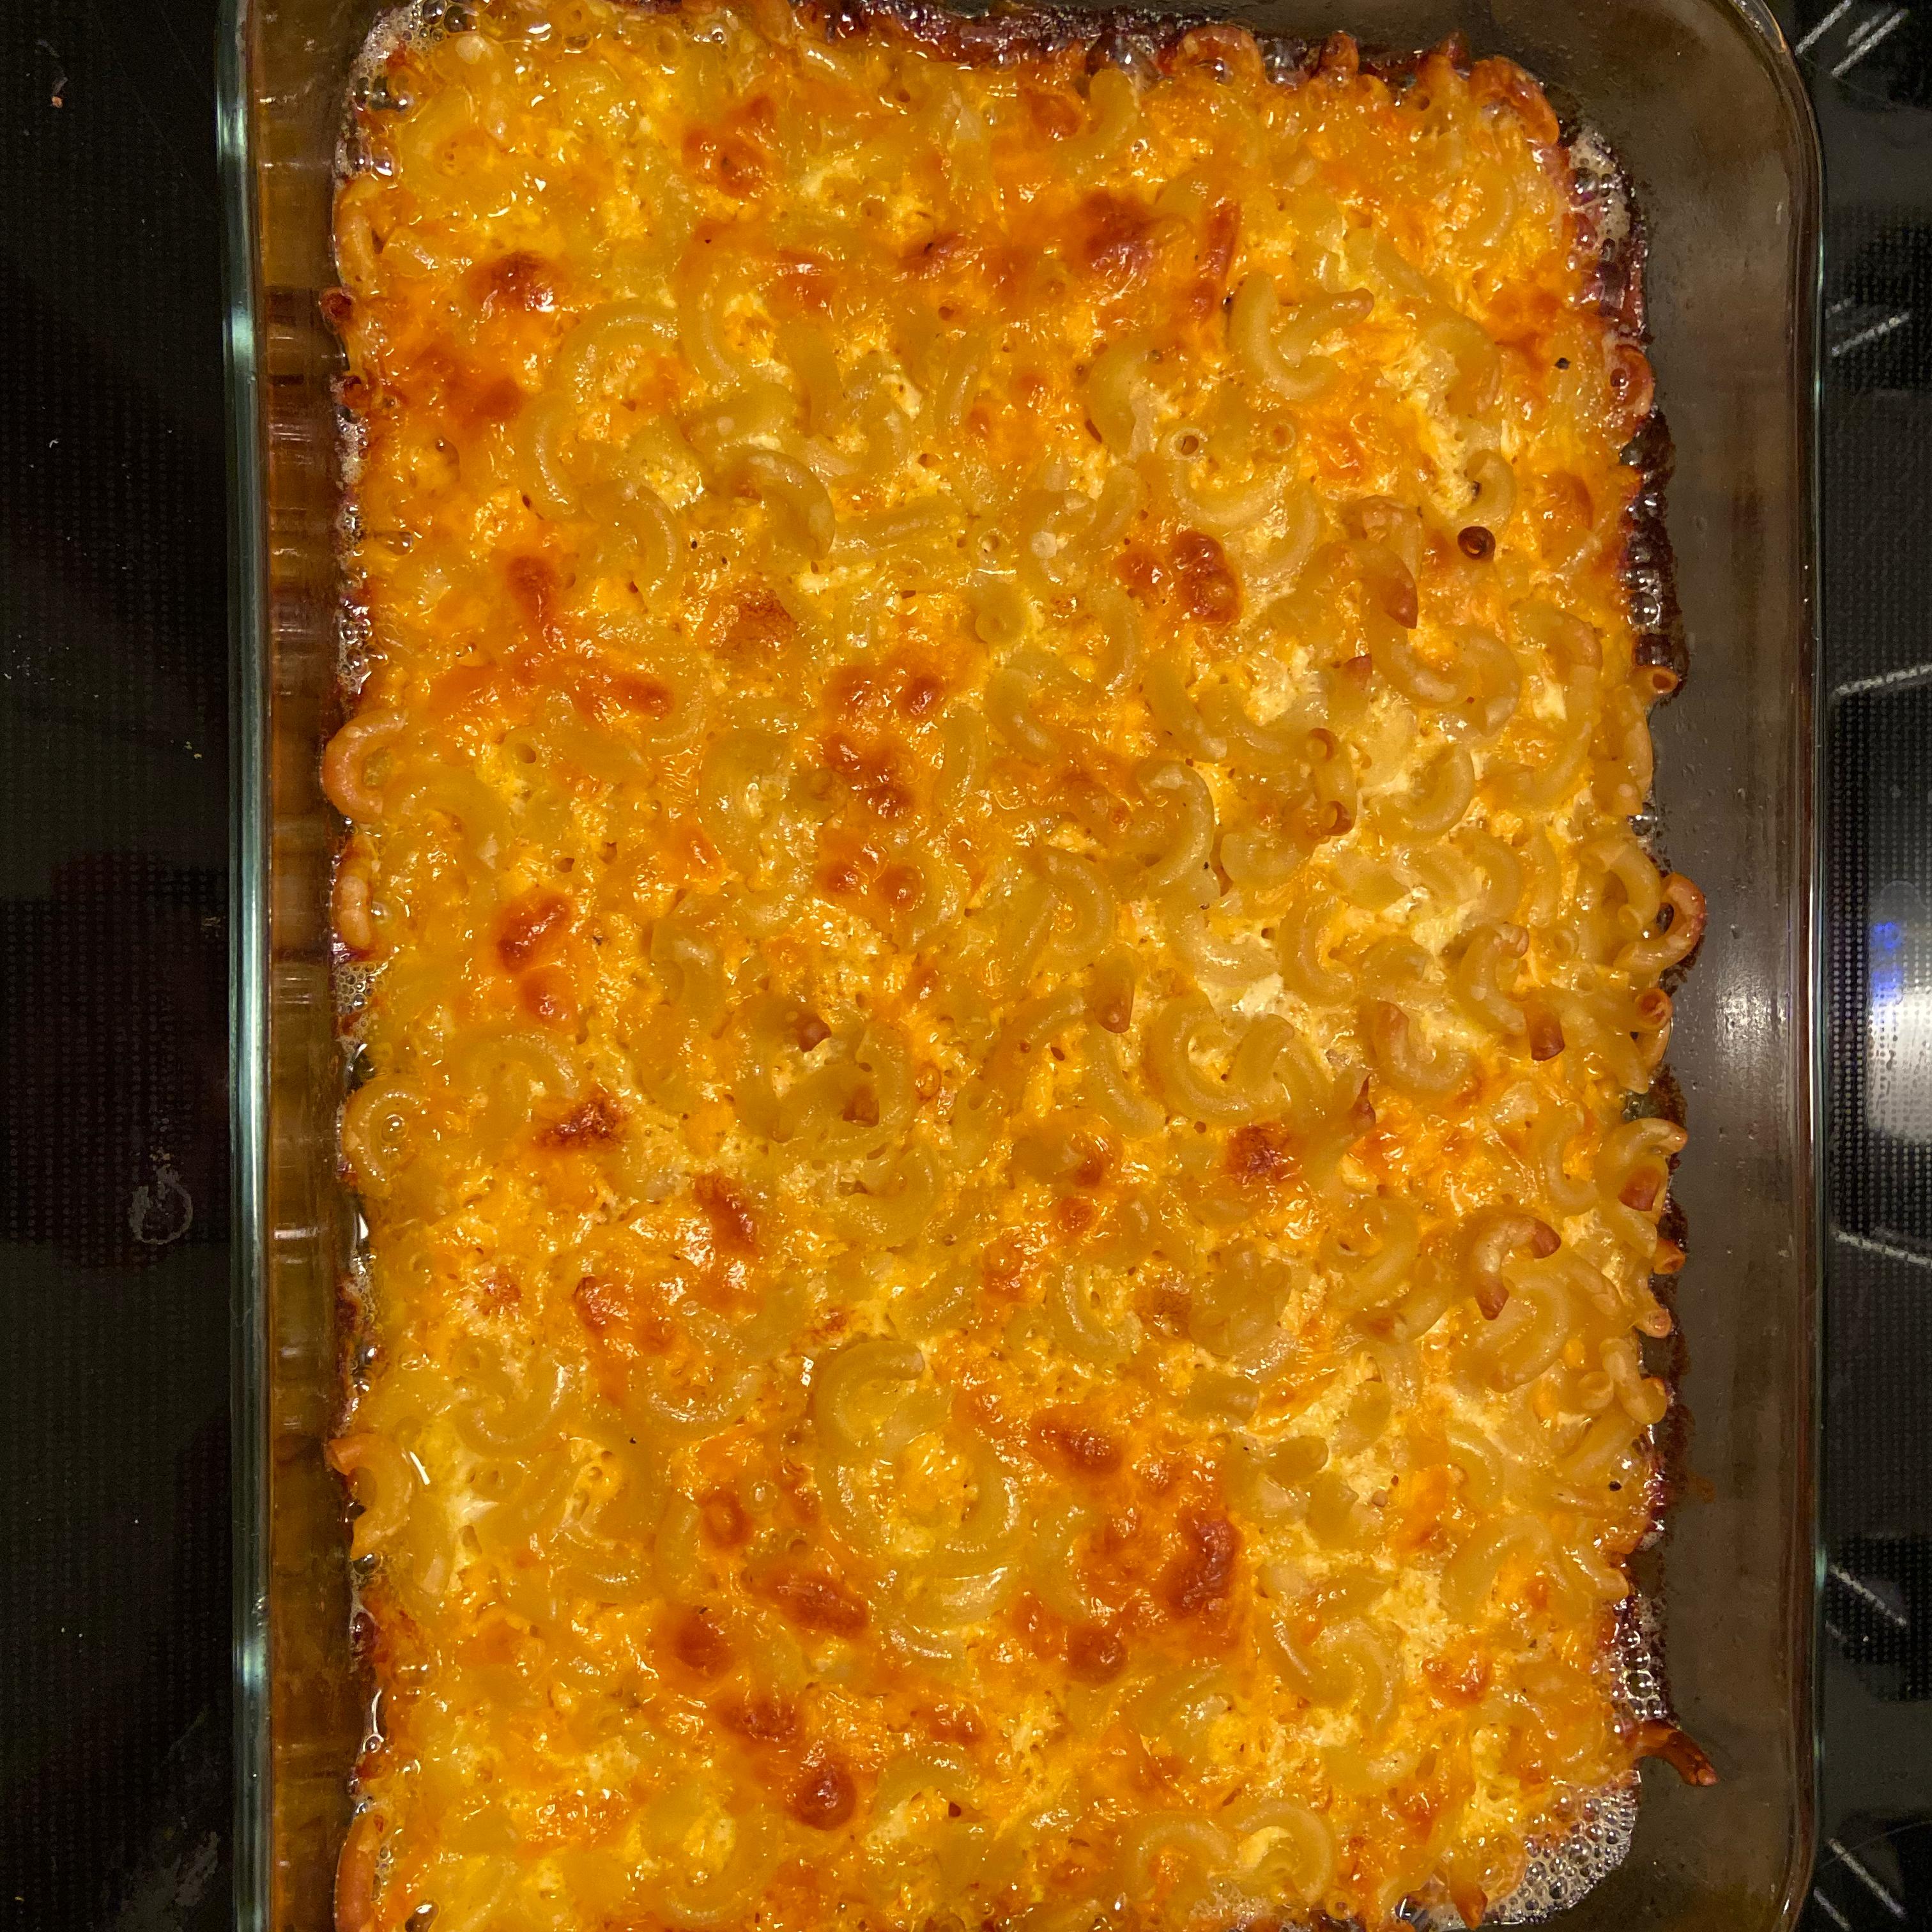 Grandmother's Macaroni and Cheese